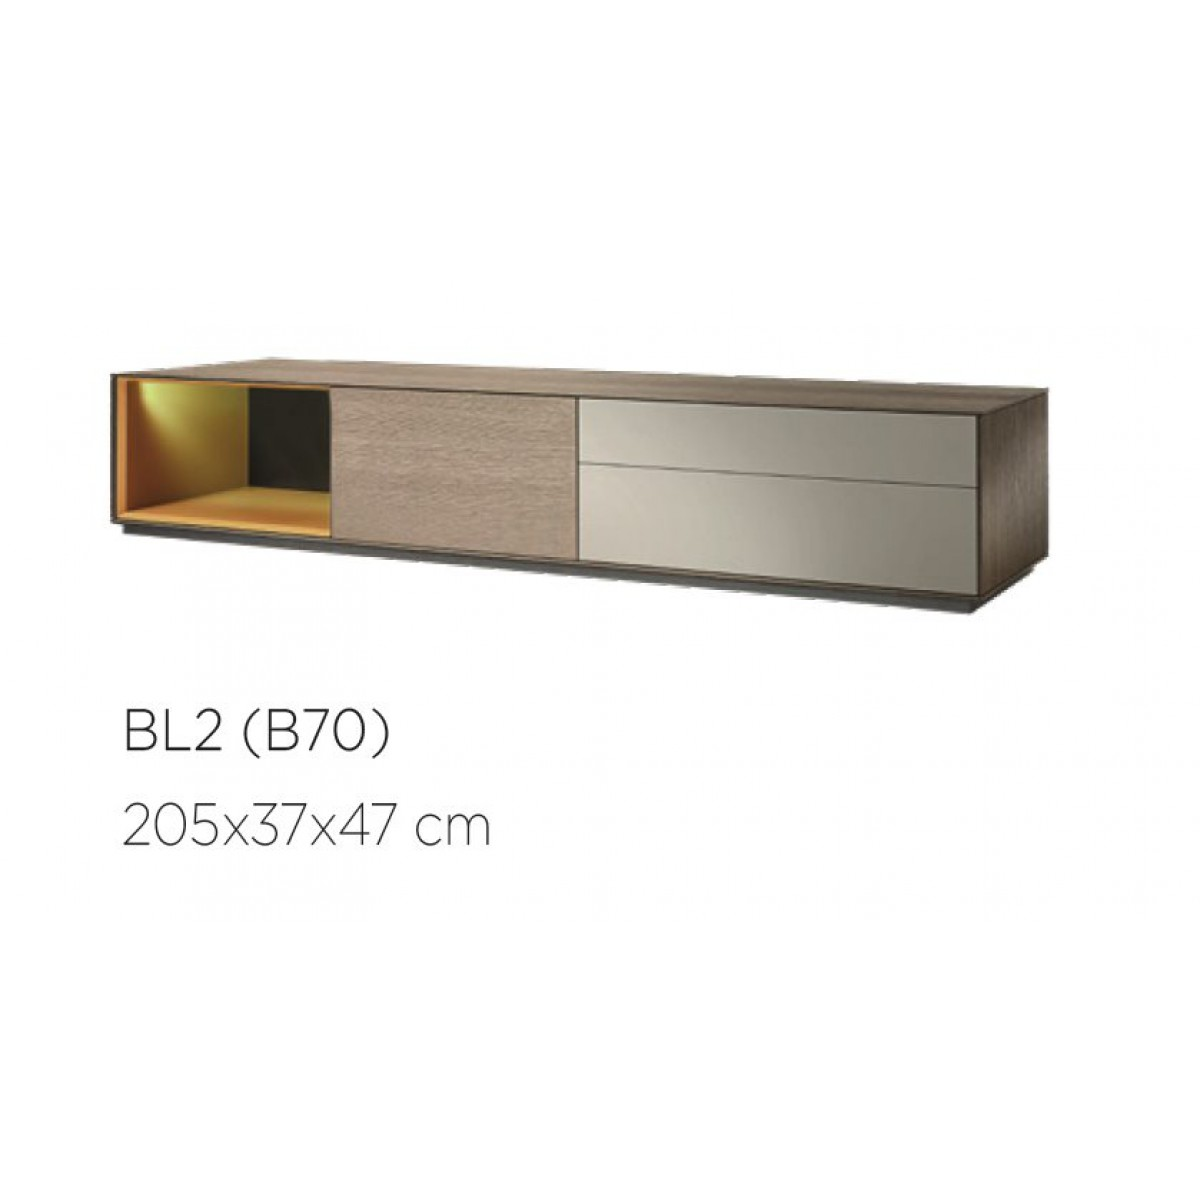 tv-meubel-sokkel-dressoir-bloom-eiken-BL2-miltonhouse-plint-hangend